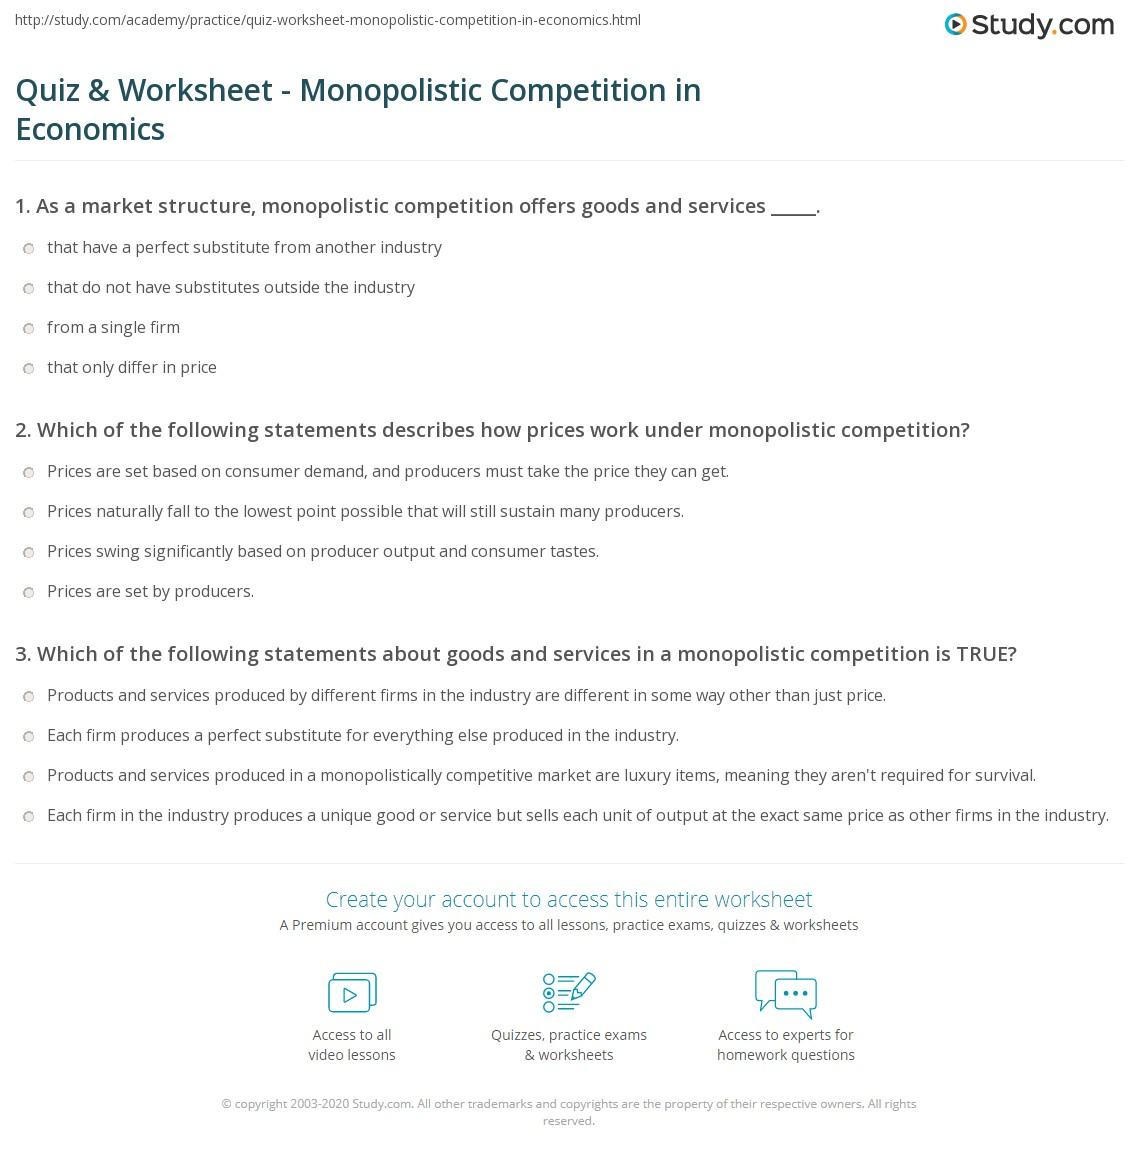 Quiz Worksheet Monopolistic Competition In Economics Study Com